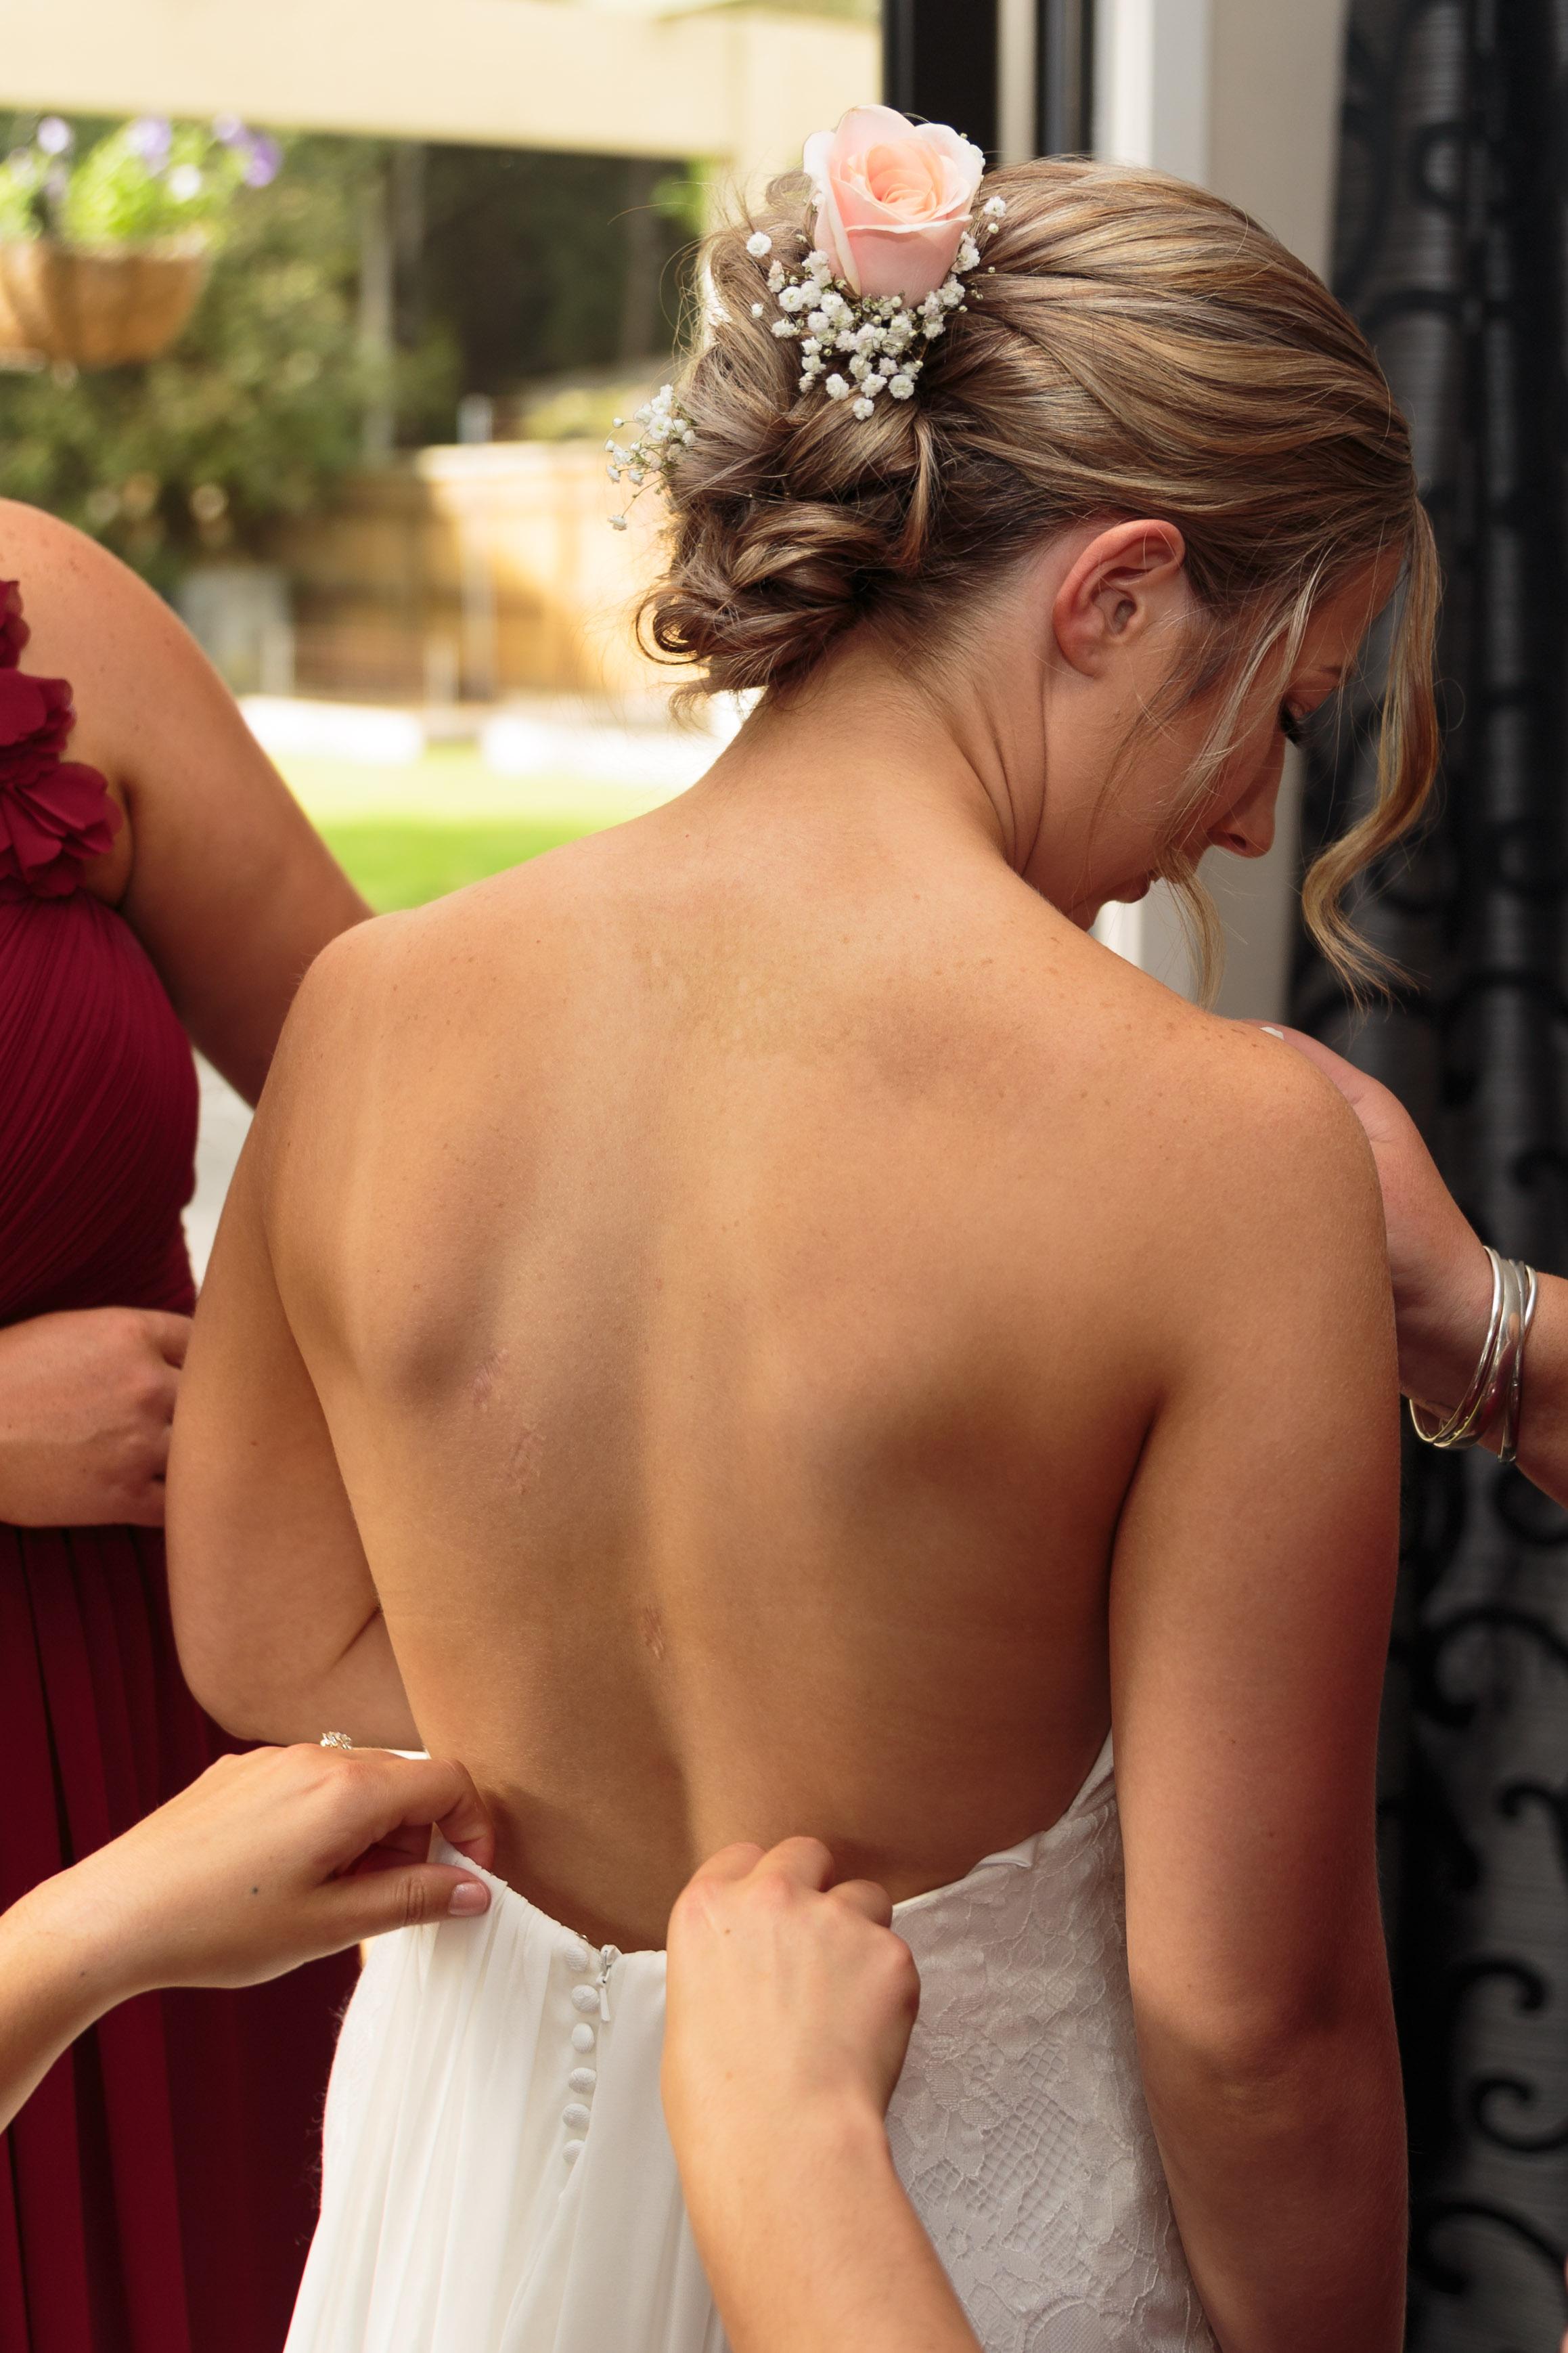 Highight-wedding-photography-dudding-lake-palmerston-north-new-zealand-8.jpg